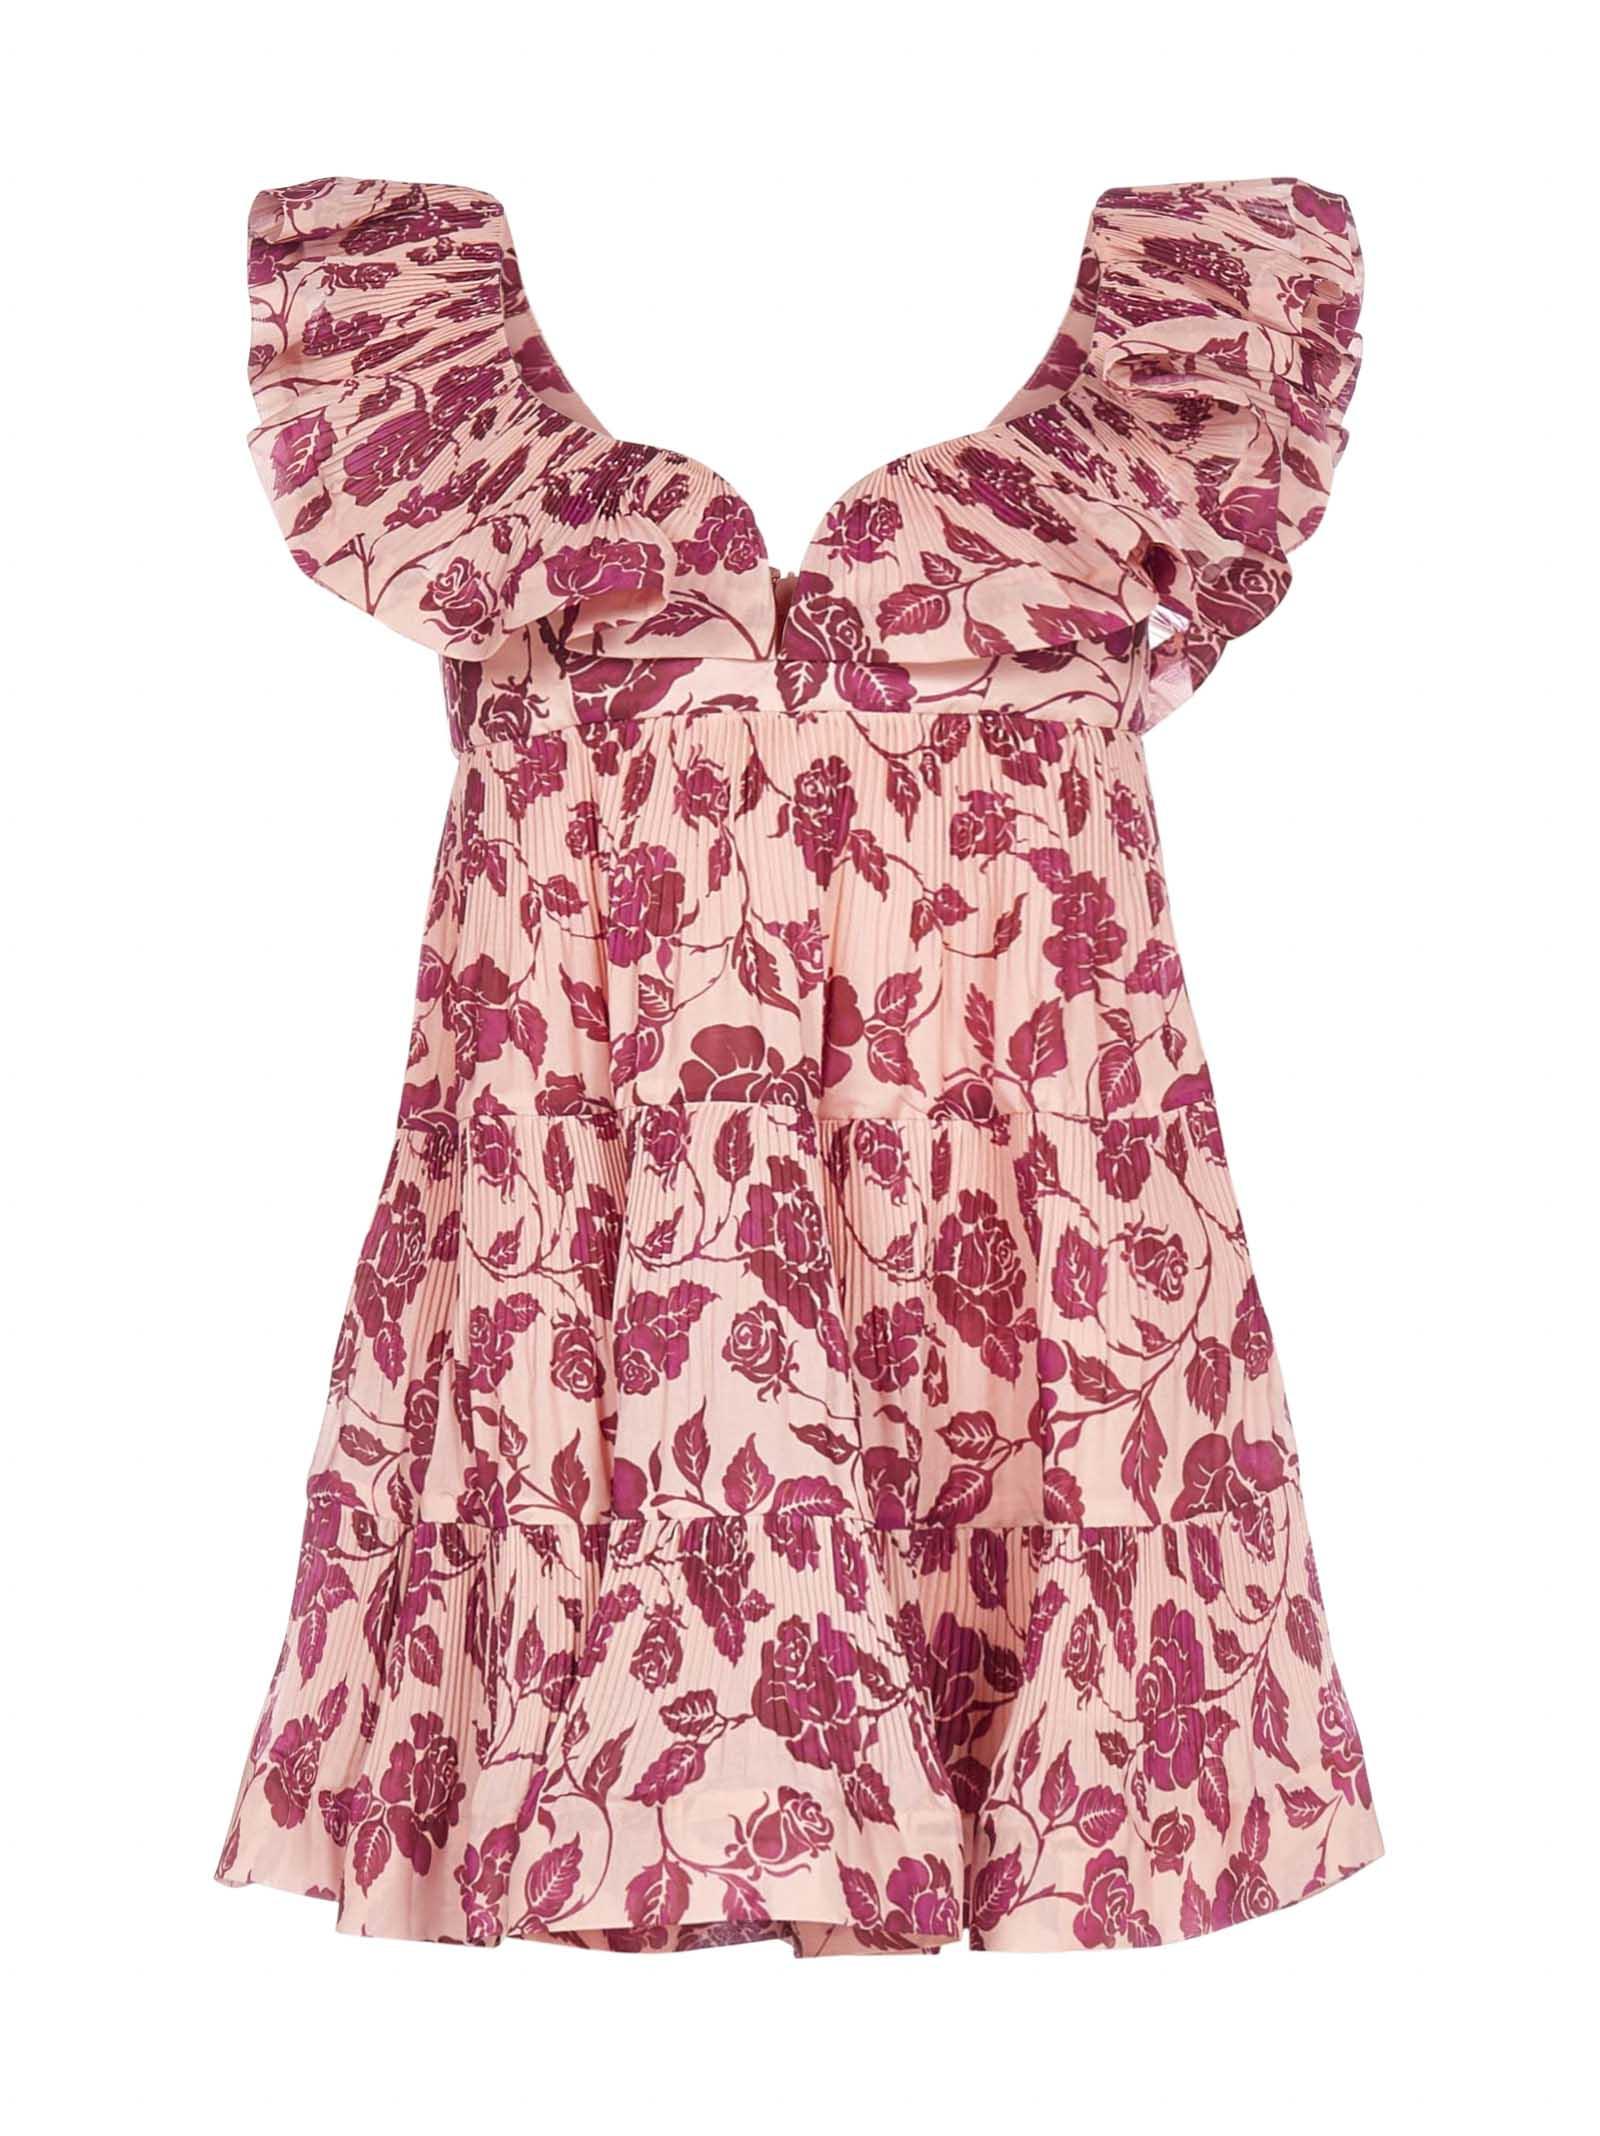 Buy Zimmermann The Lovestruck Floral Print Mini Dress online, shop Zimmermann with free shipping